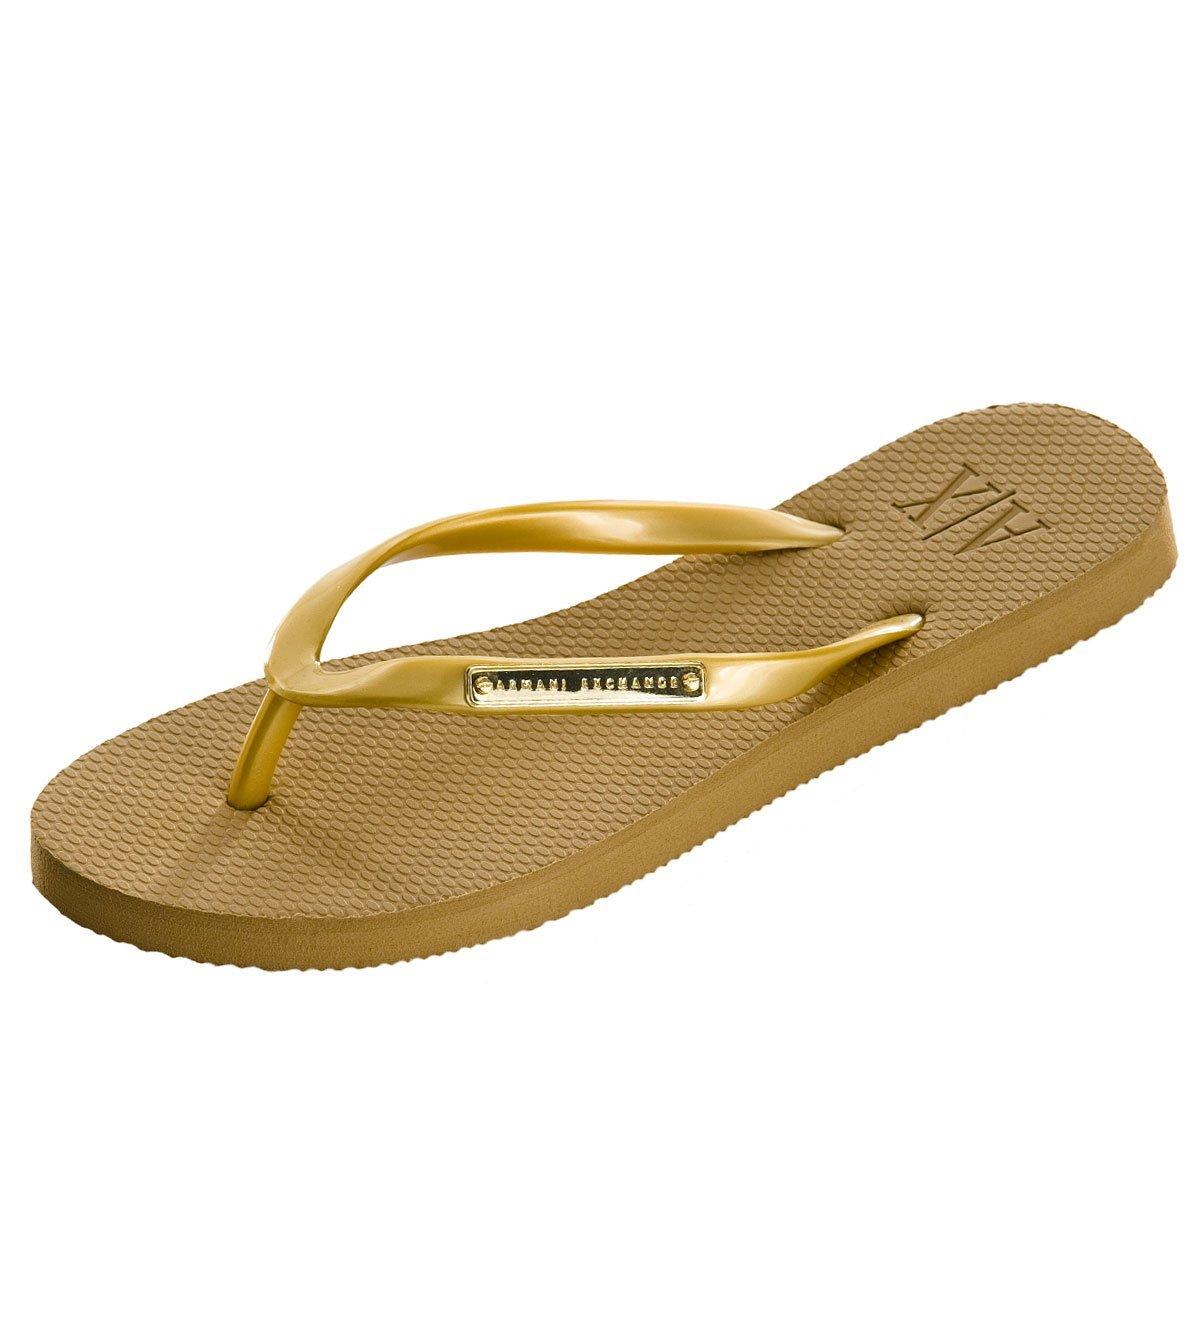 577479a5f ... Armani Exchange Womens Logo Plate Flip Flop - Gold Image 3. Sale